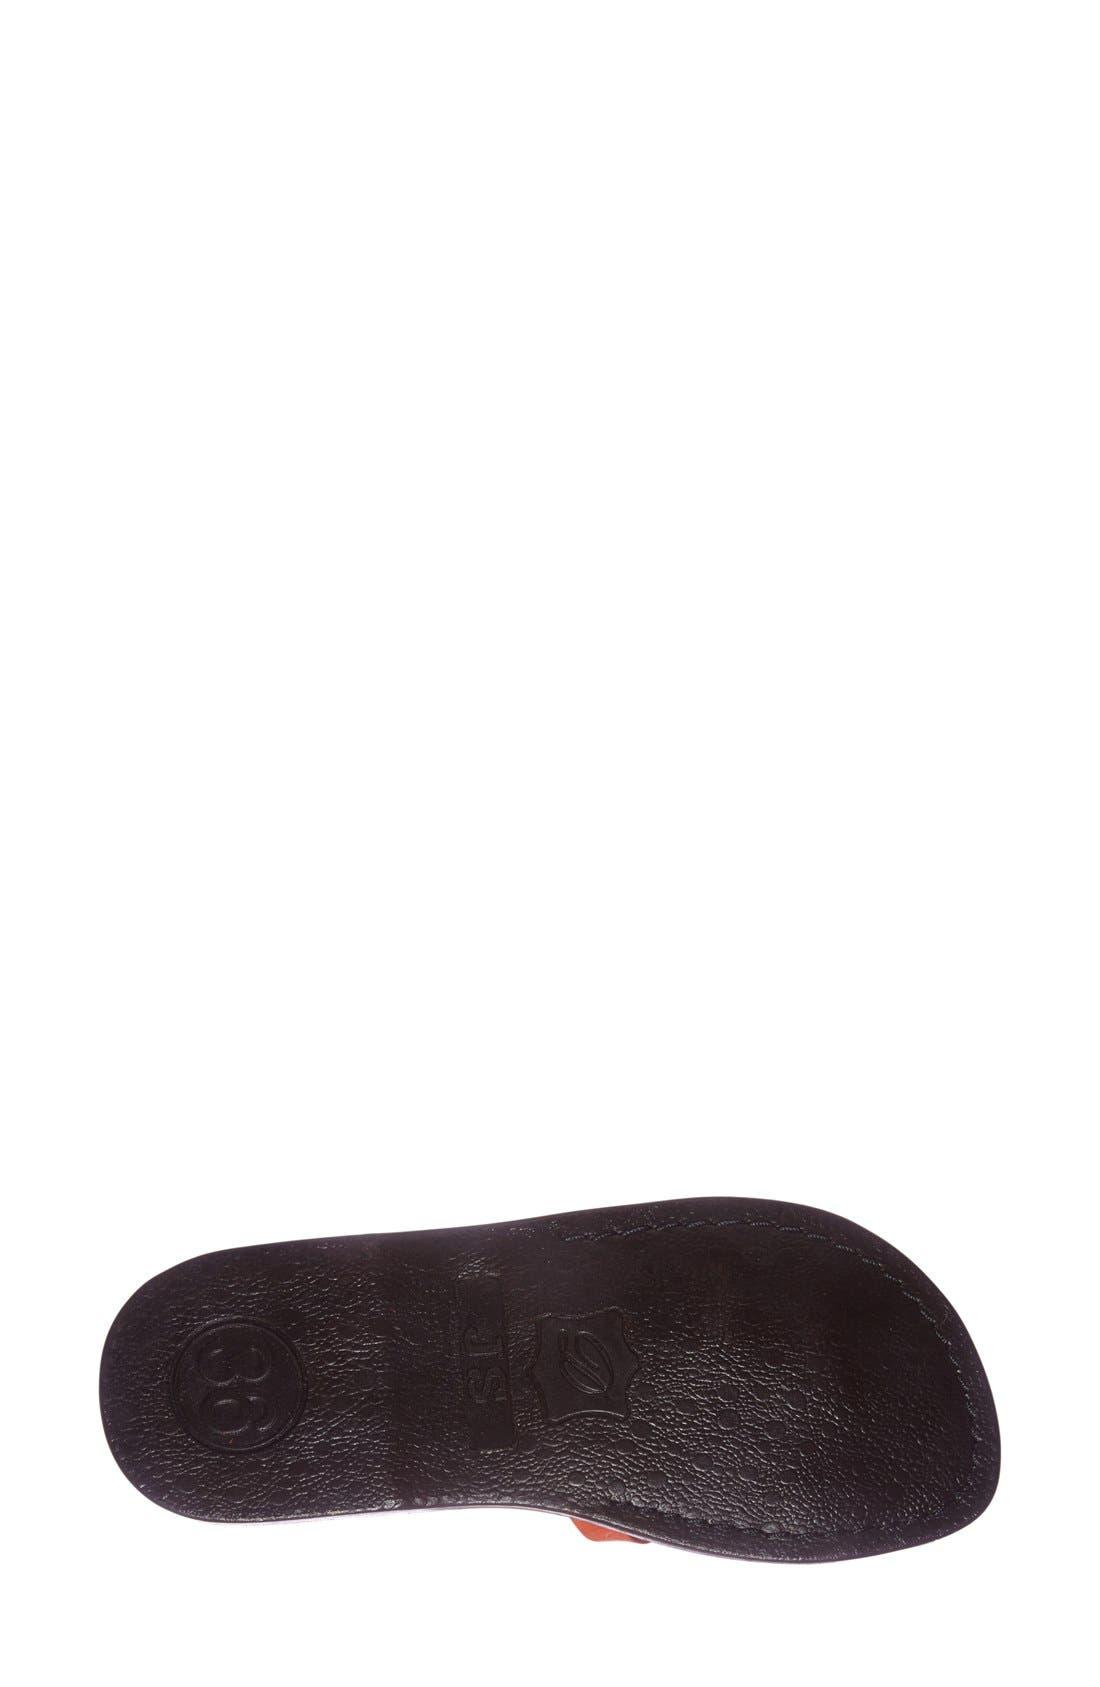 'The Good Shepard' Leather Sandal,                             Alternate thumbnail 32, color,